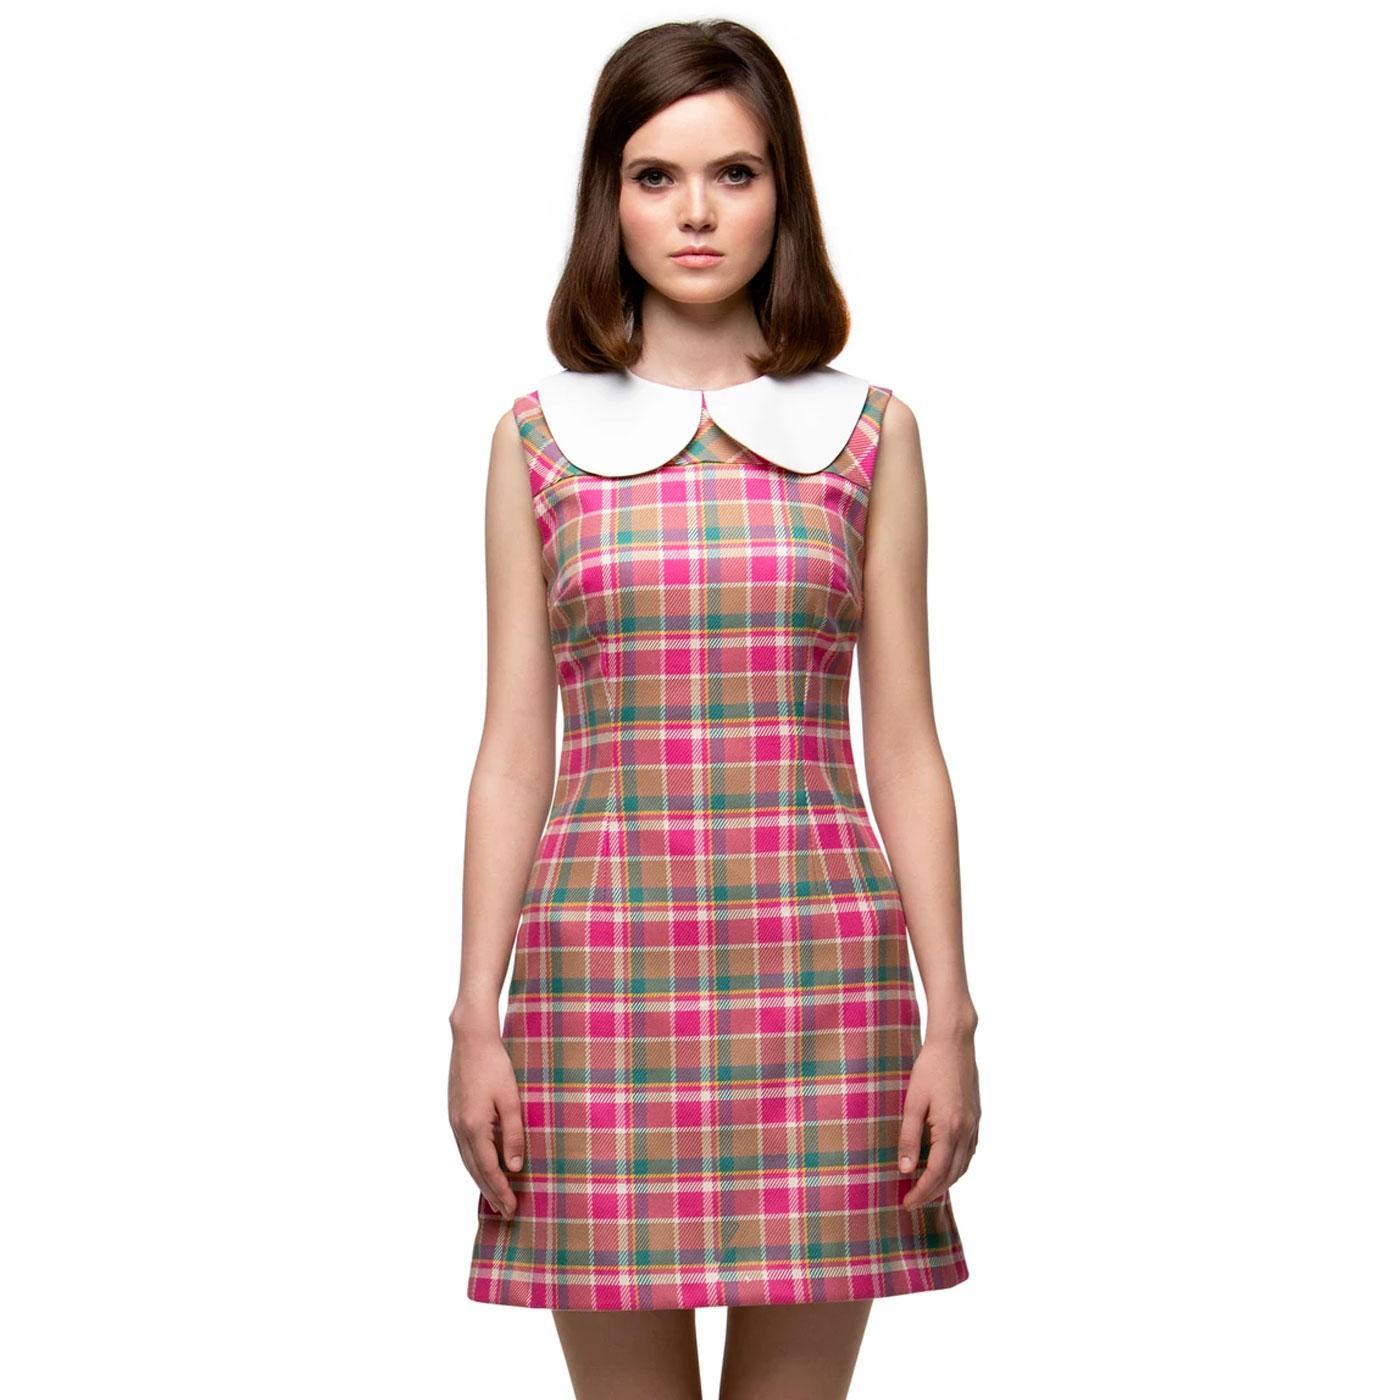 MARMALADE Mod Oversized Collar Plaid Check Dress